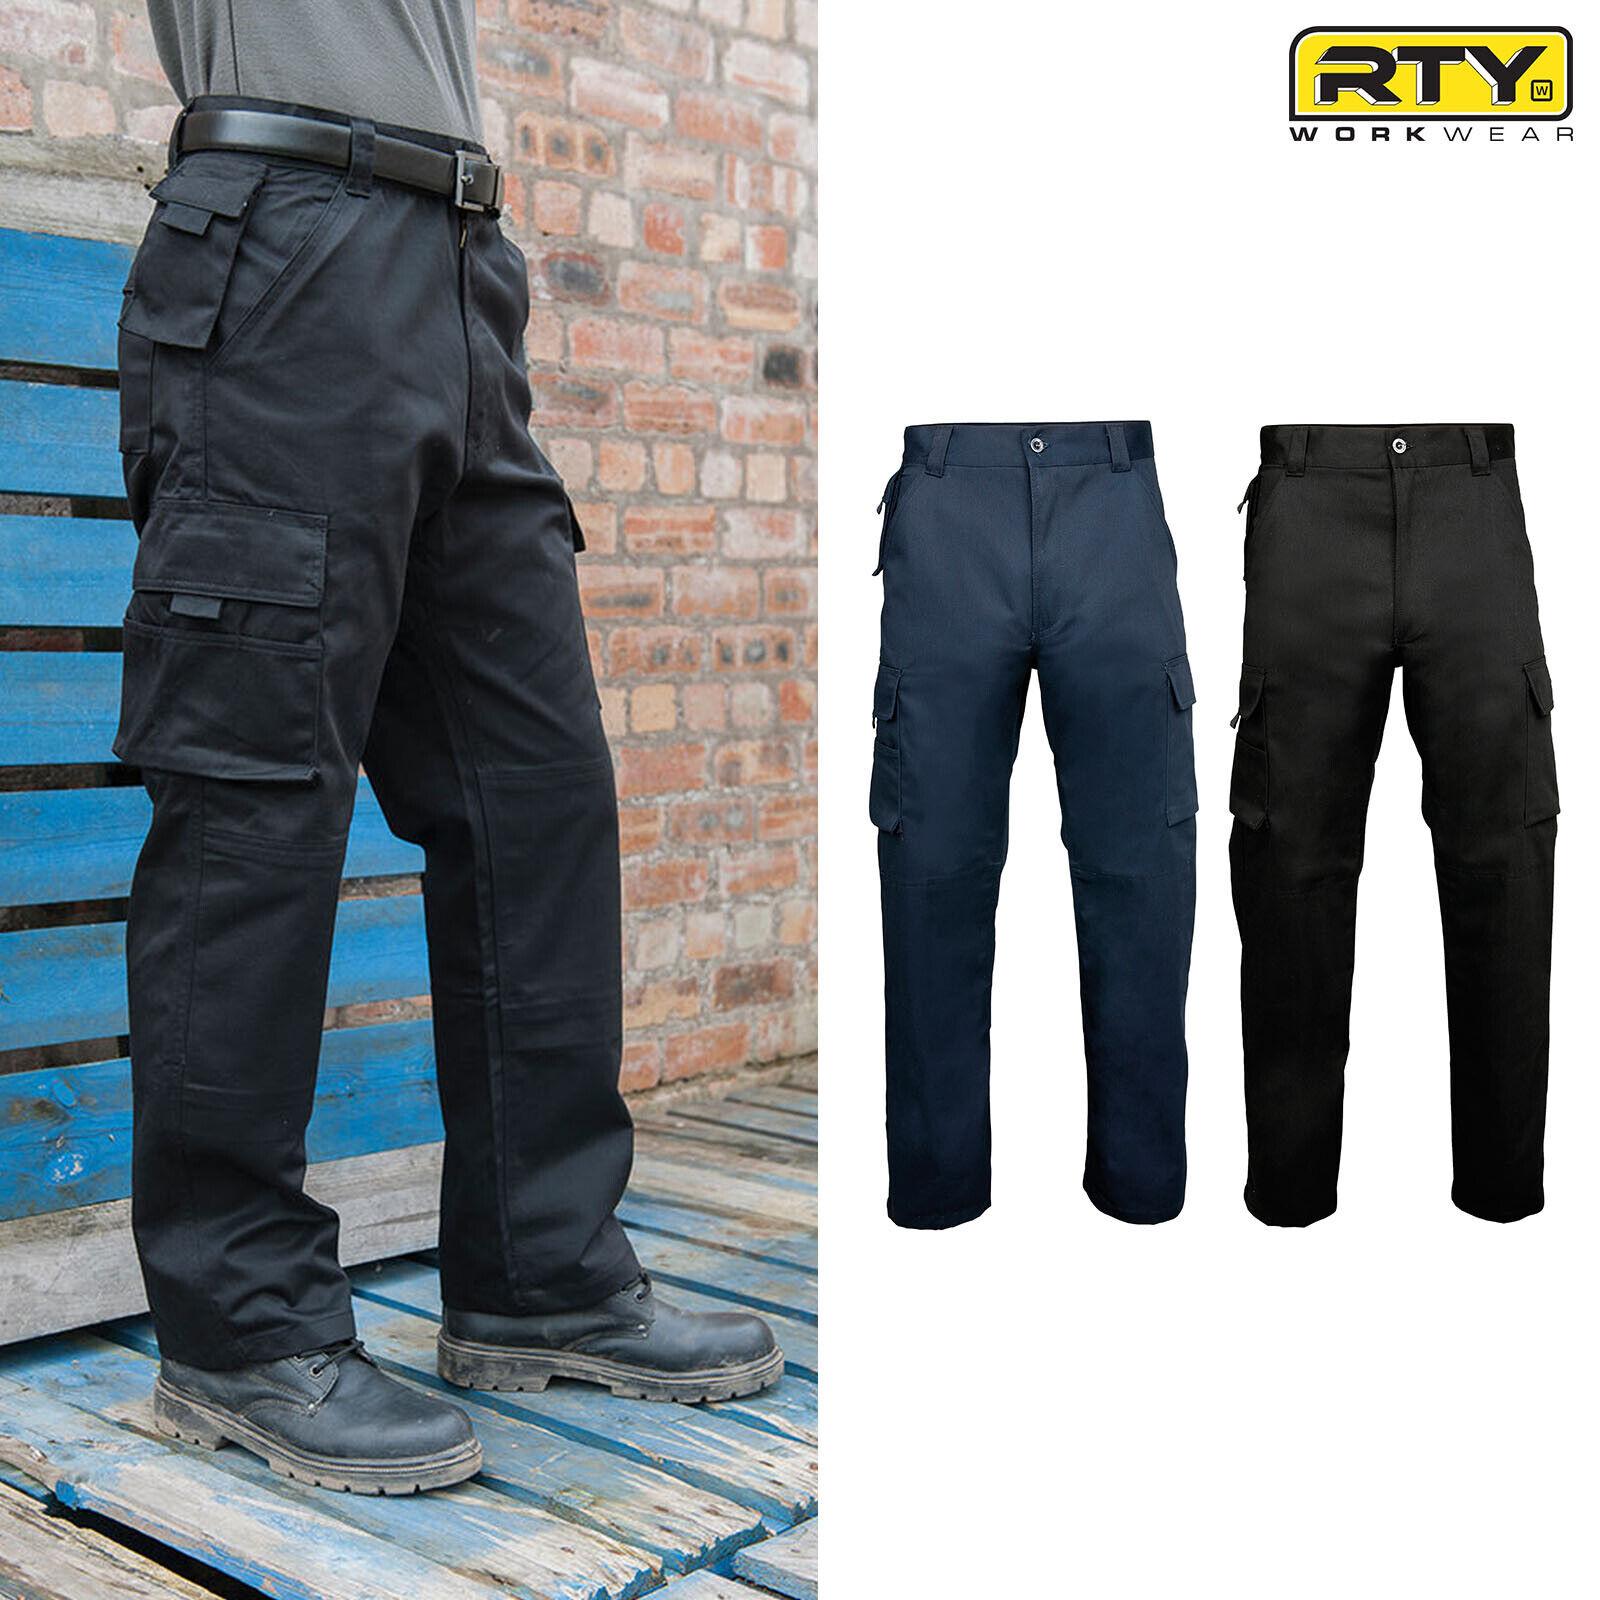 RTY Premium Workwear Trousers RTY048